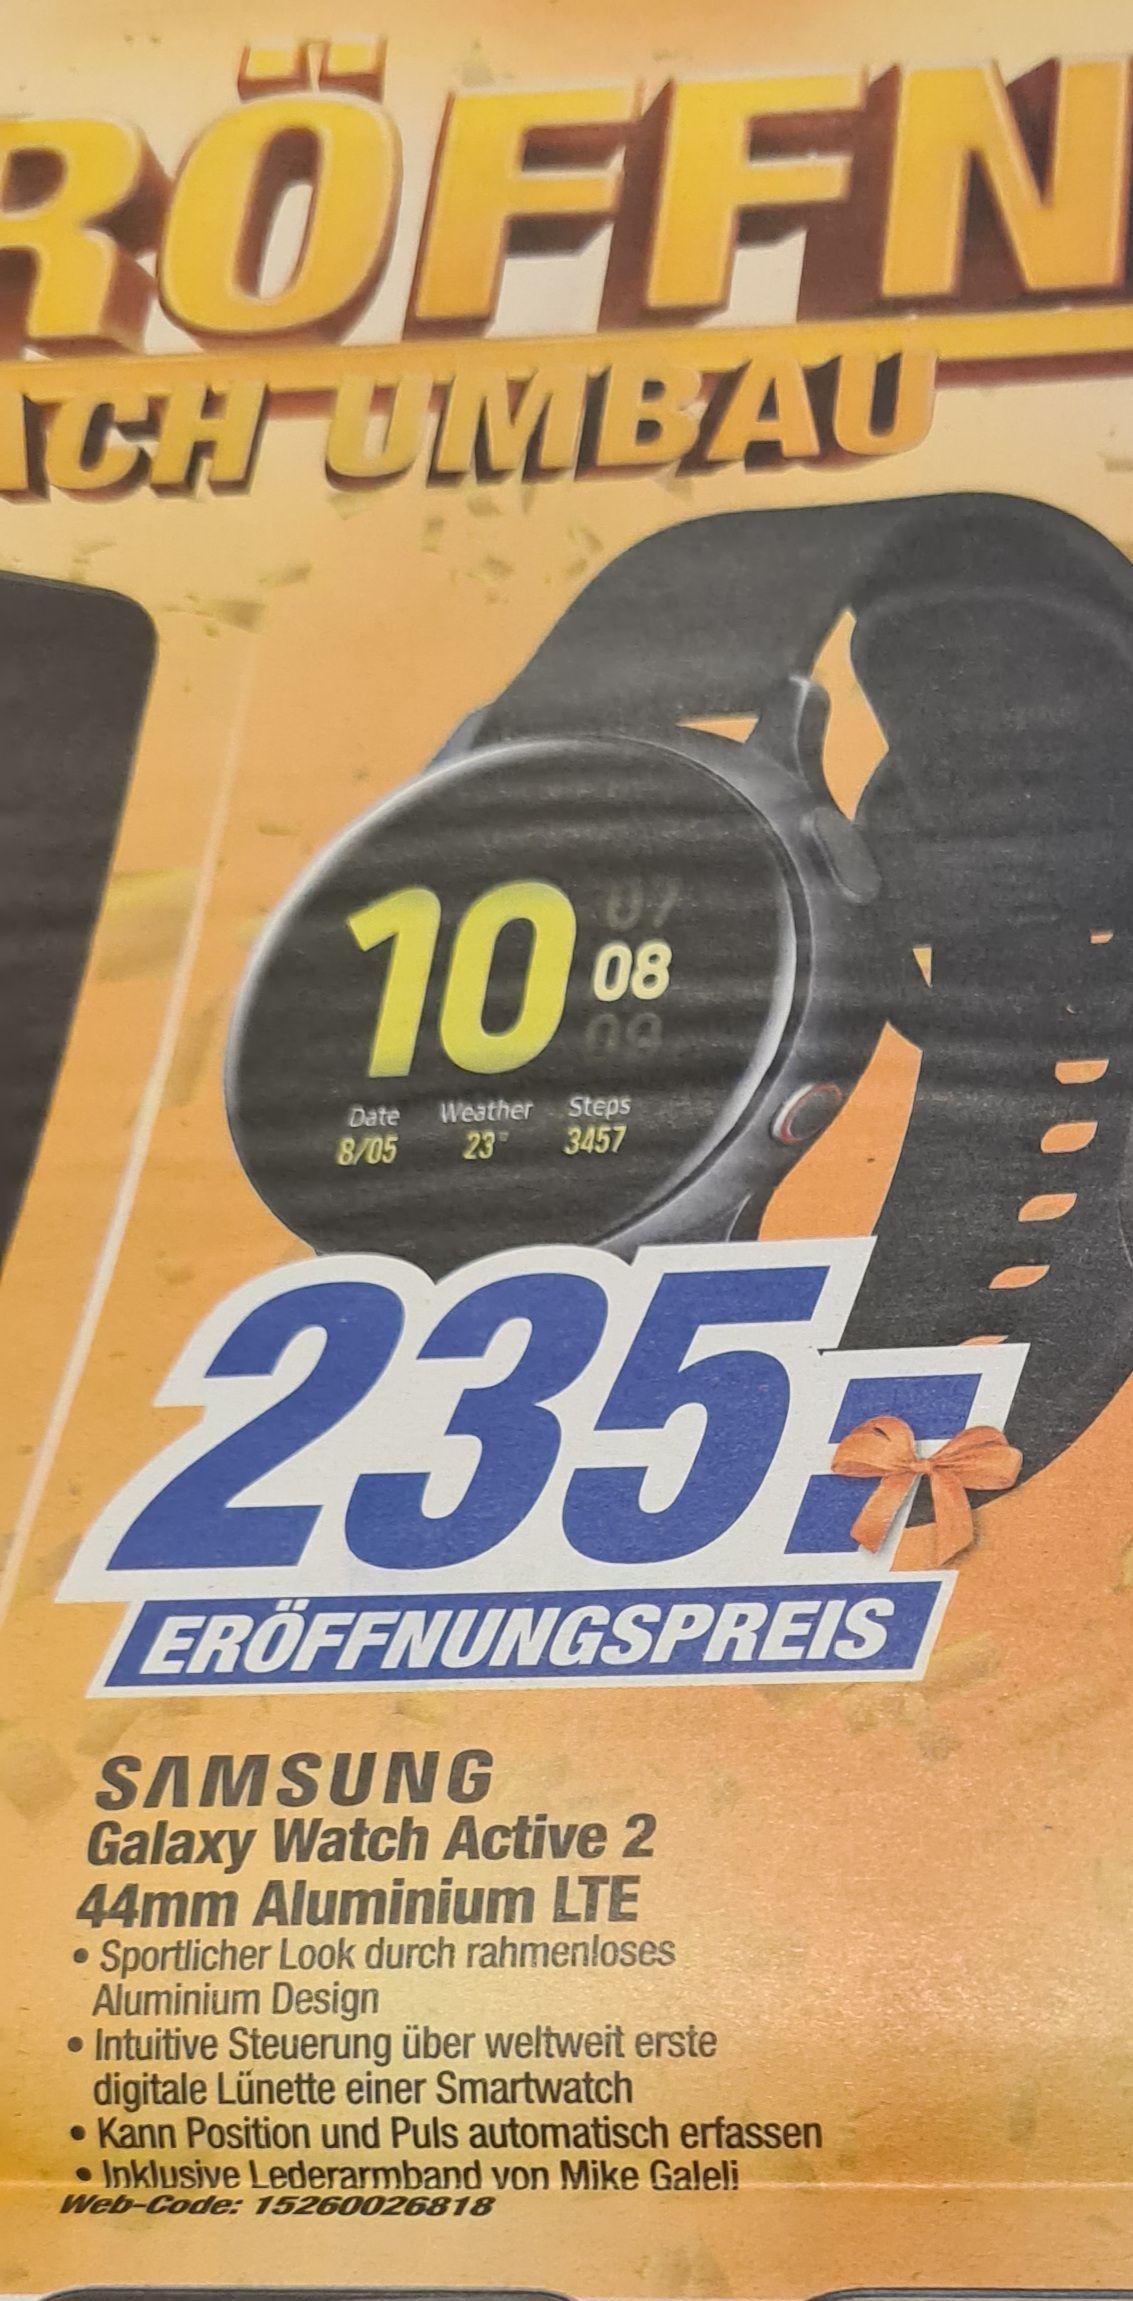 Samsung Galaxy Watch Active 2 LTE 44mm Aluminium [Lokal Expert Region Hannover + Stadthagen + Rinteln]